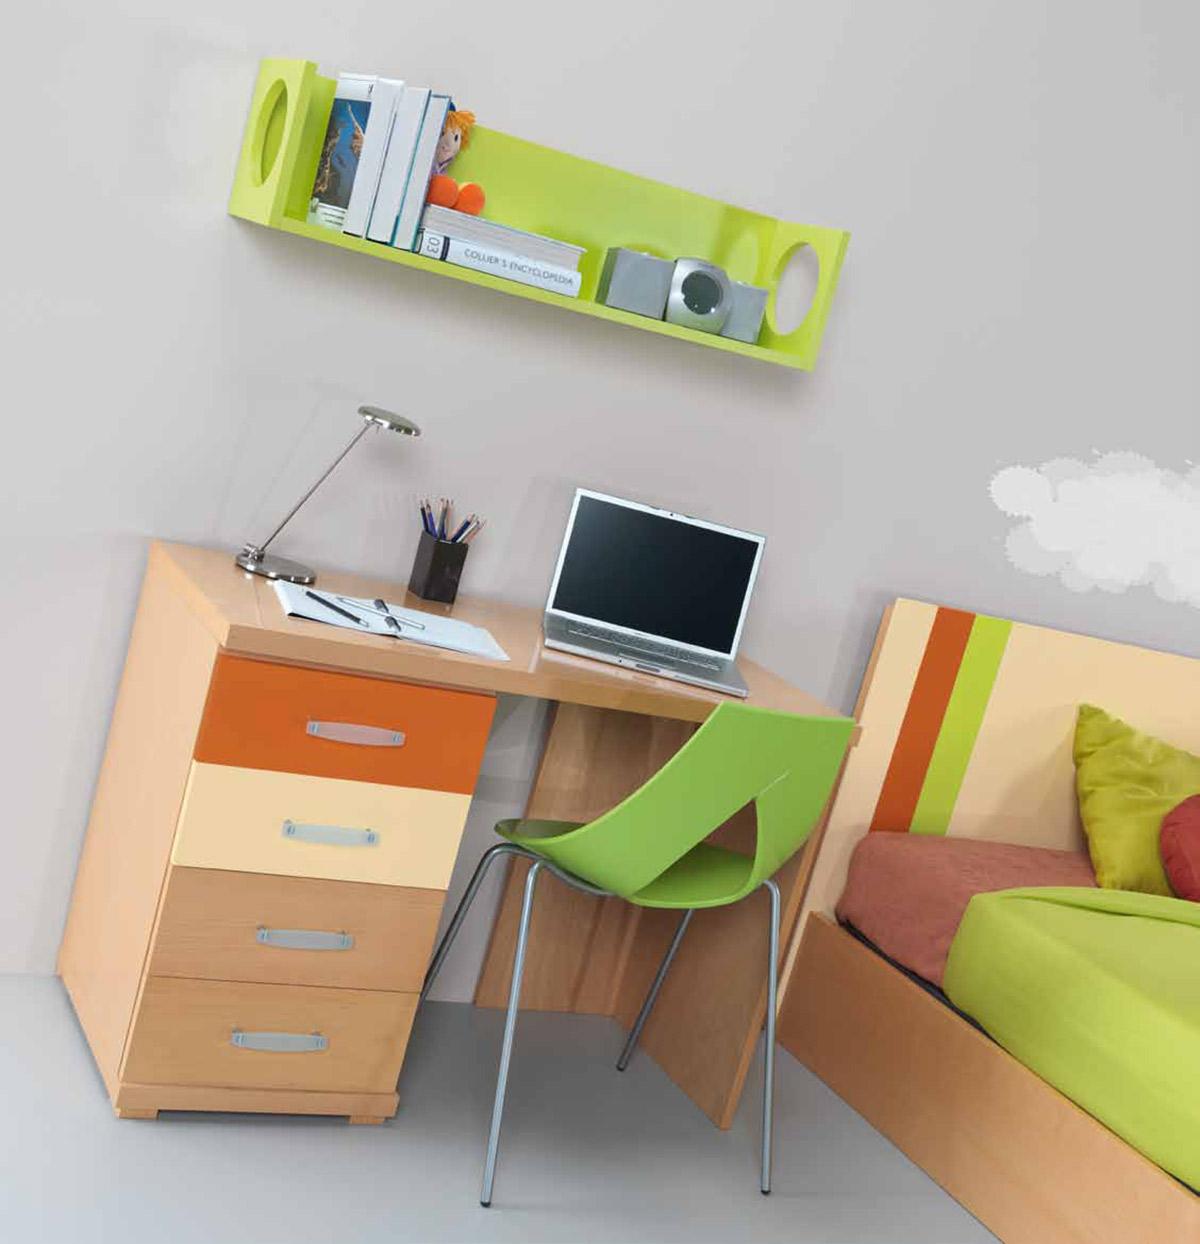 ns mobiliario linha kids concept ii 14 1 l m veis. Black Bedroom Furniture Sets. Home Design Ideas